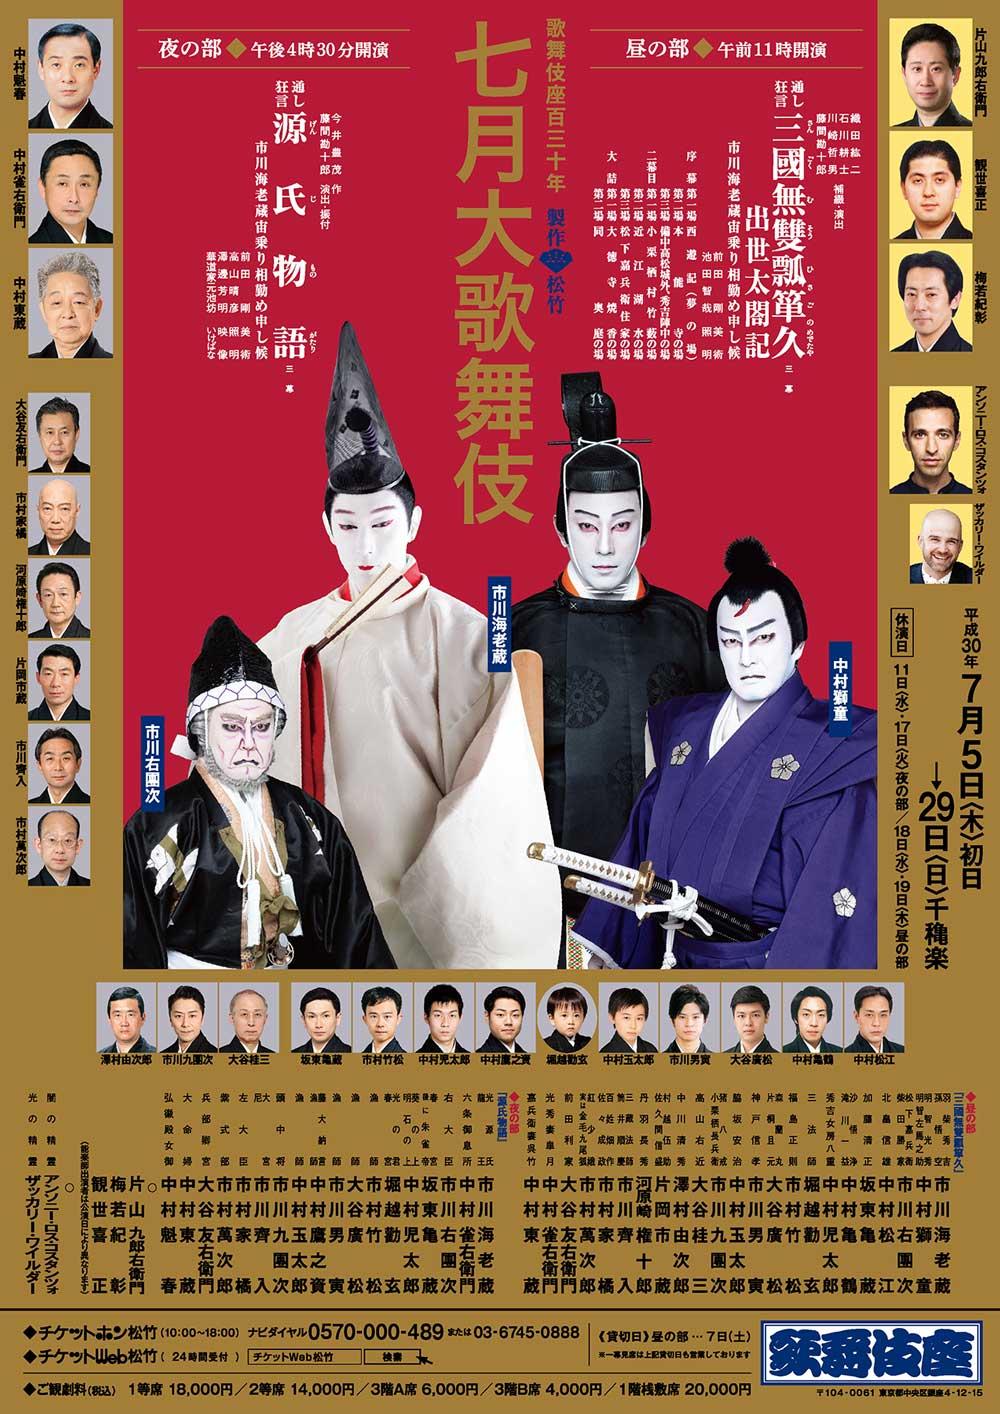 http://www.kabuki-bito.jp/uploads/images/kouen/569/kabukiza_201807_f5_3d82cbba4495ec0b19be795f19671bc9.jpg